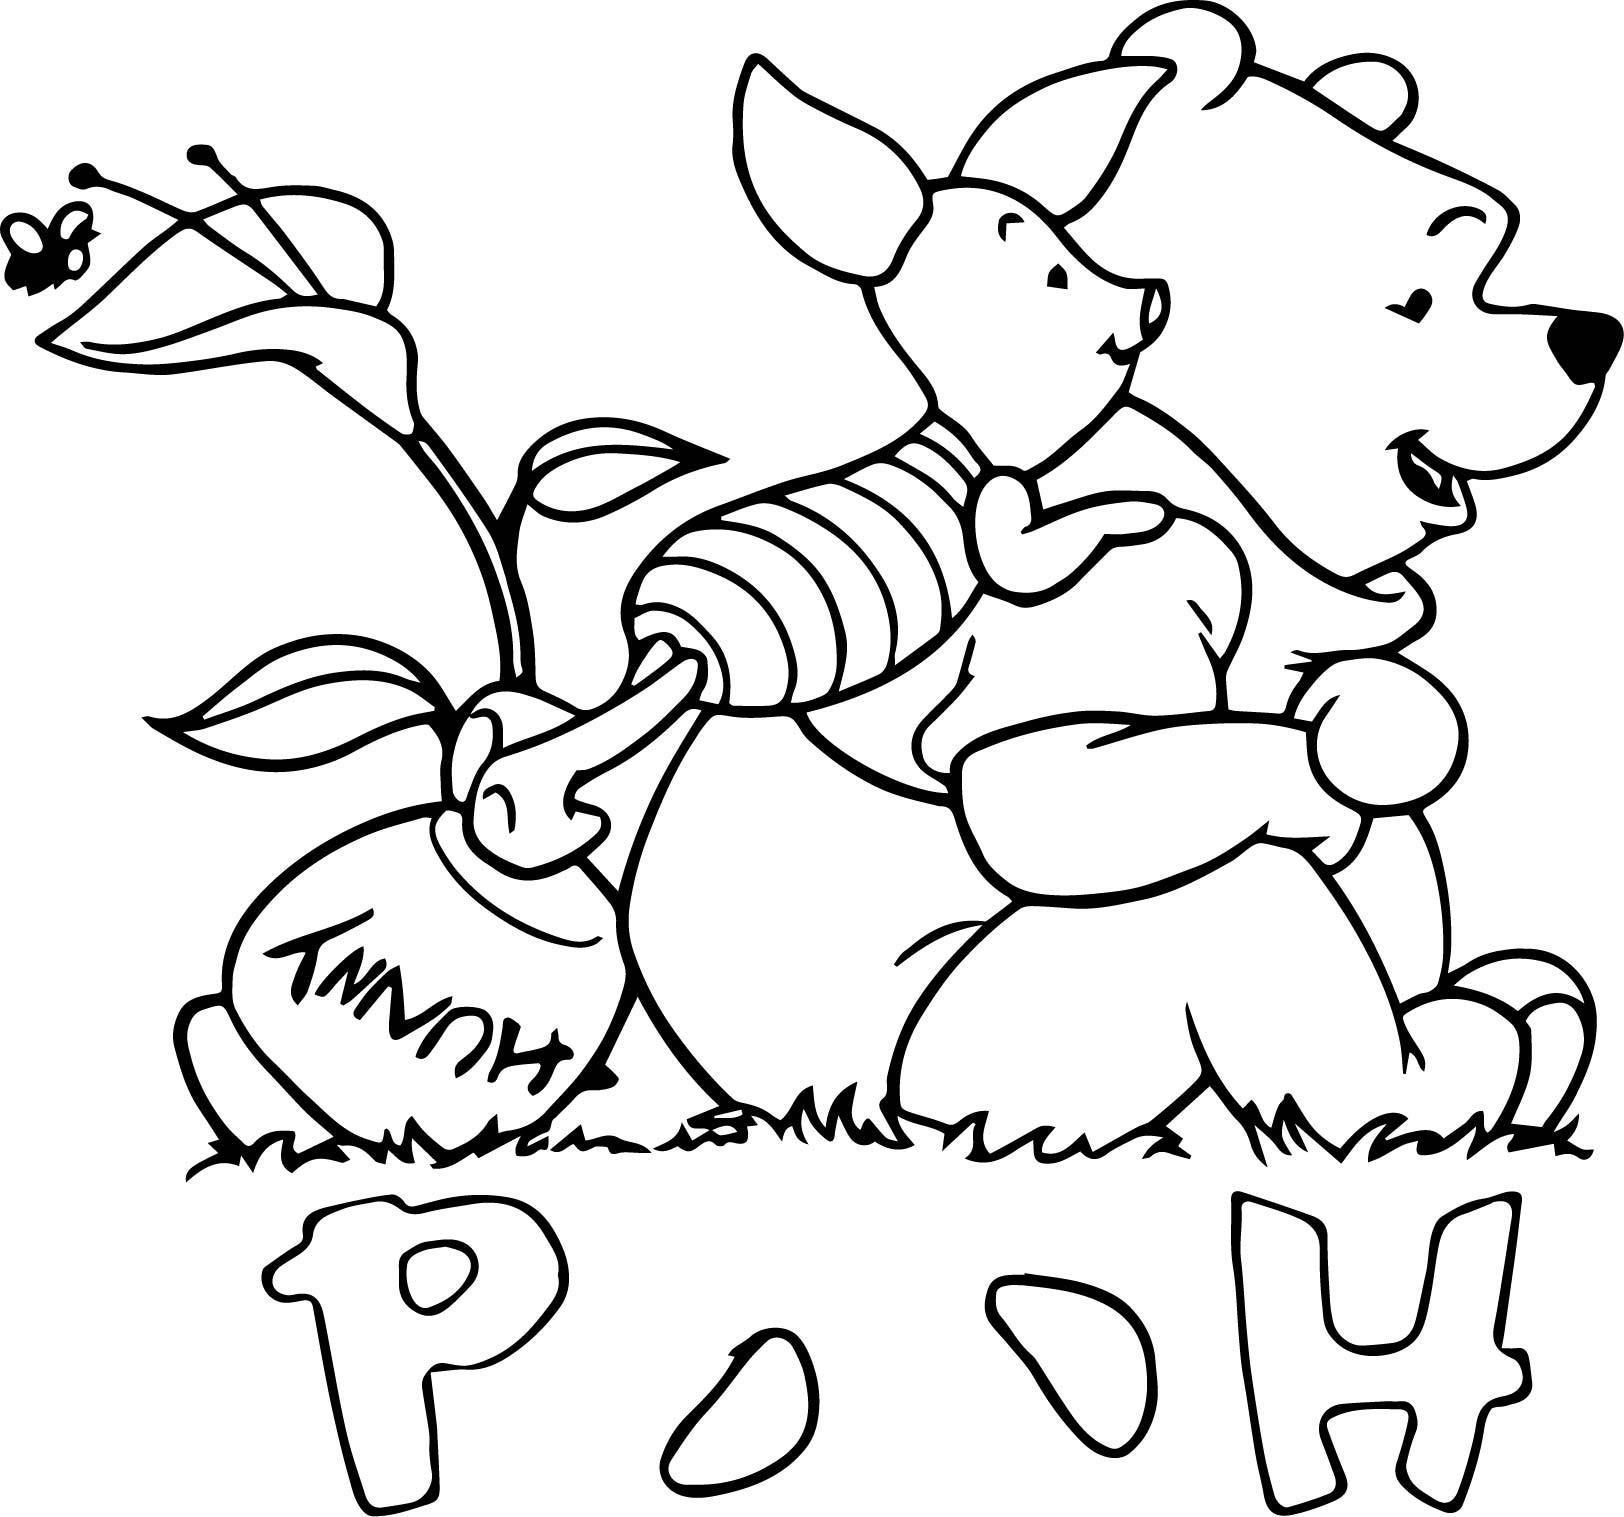 Baby piglet winnie the pooh looking coloring page for Winnie the pooh baby coloring pages